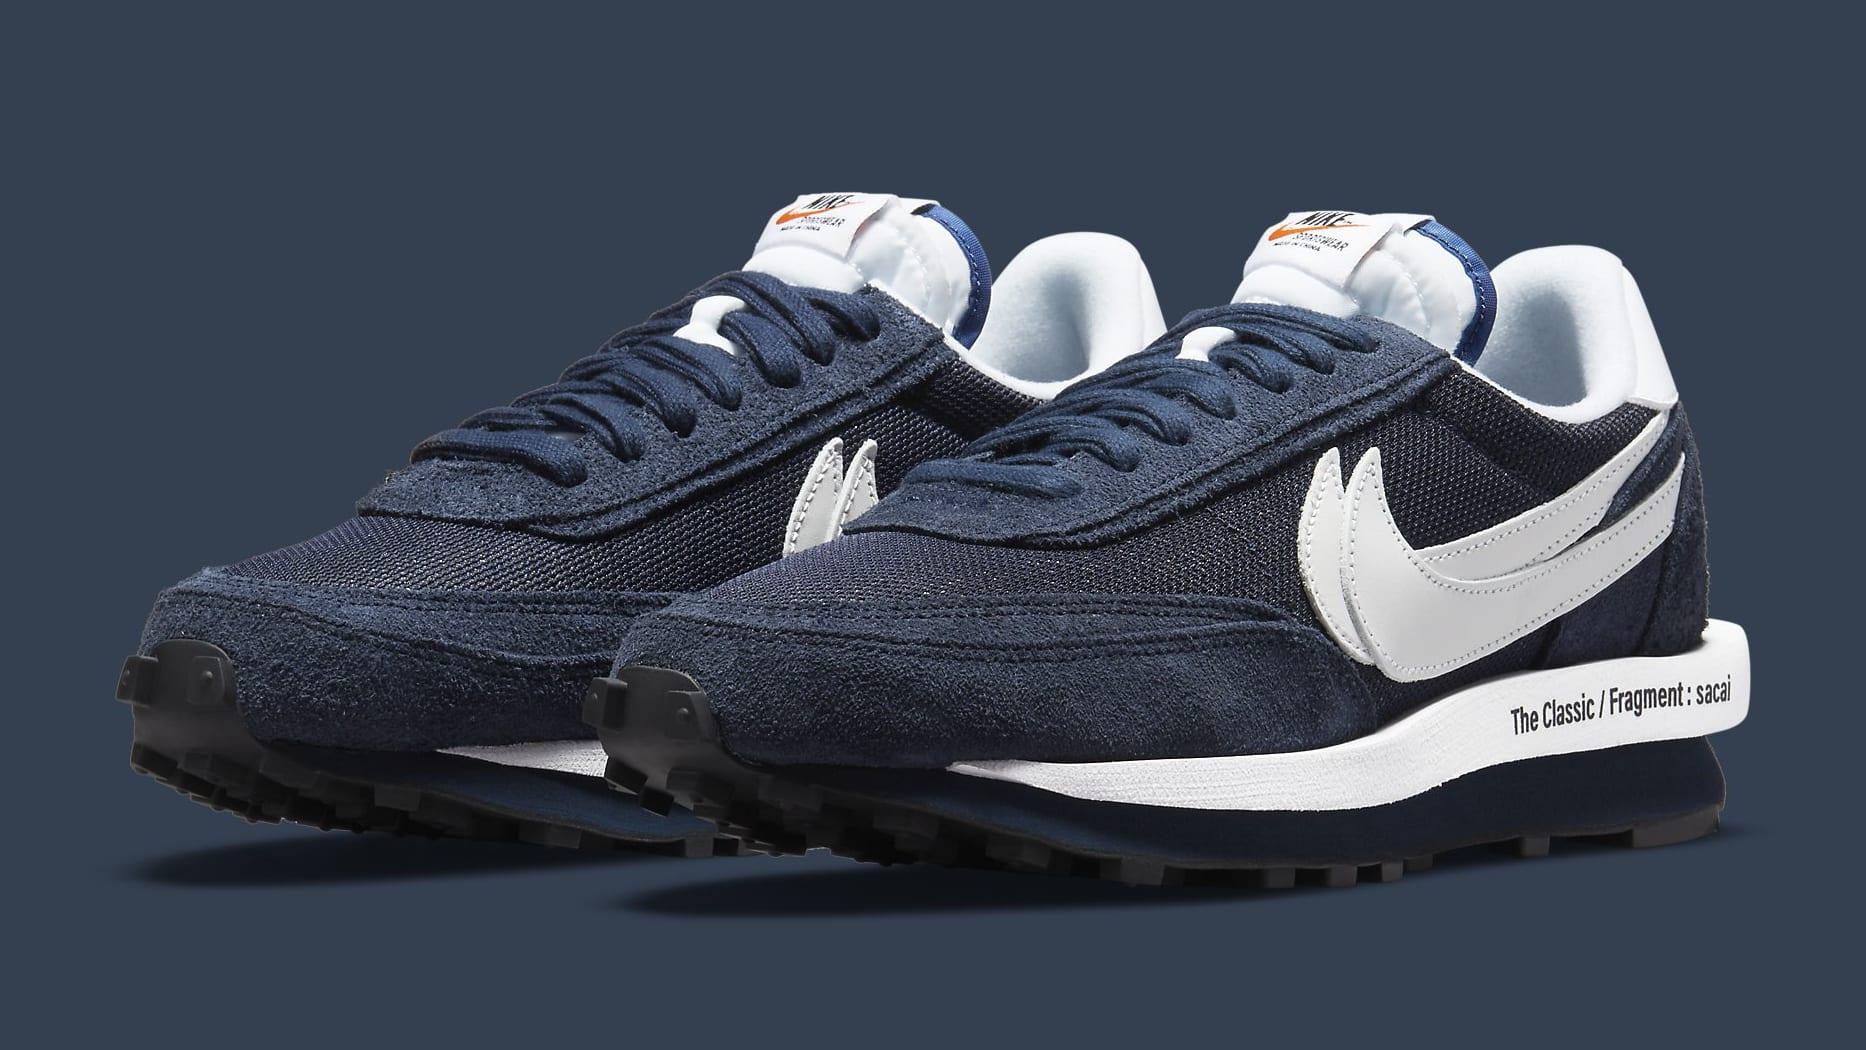 Fragment x Sacai x Nike LDWaffle 'Blackened Blue' DH2684-400 Pair